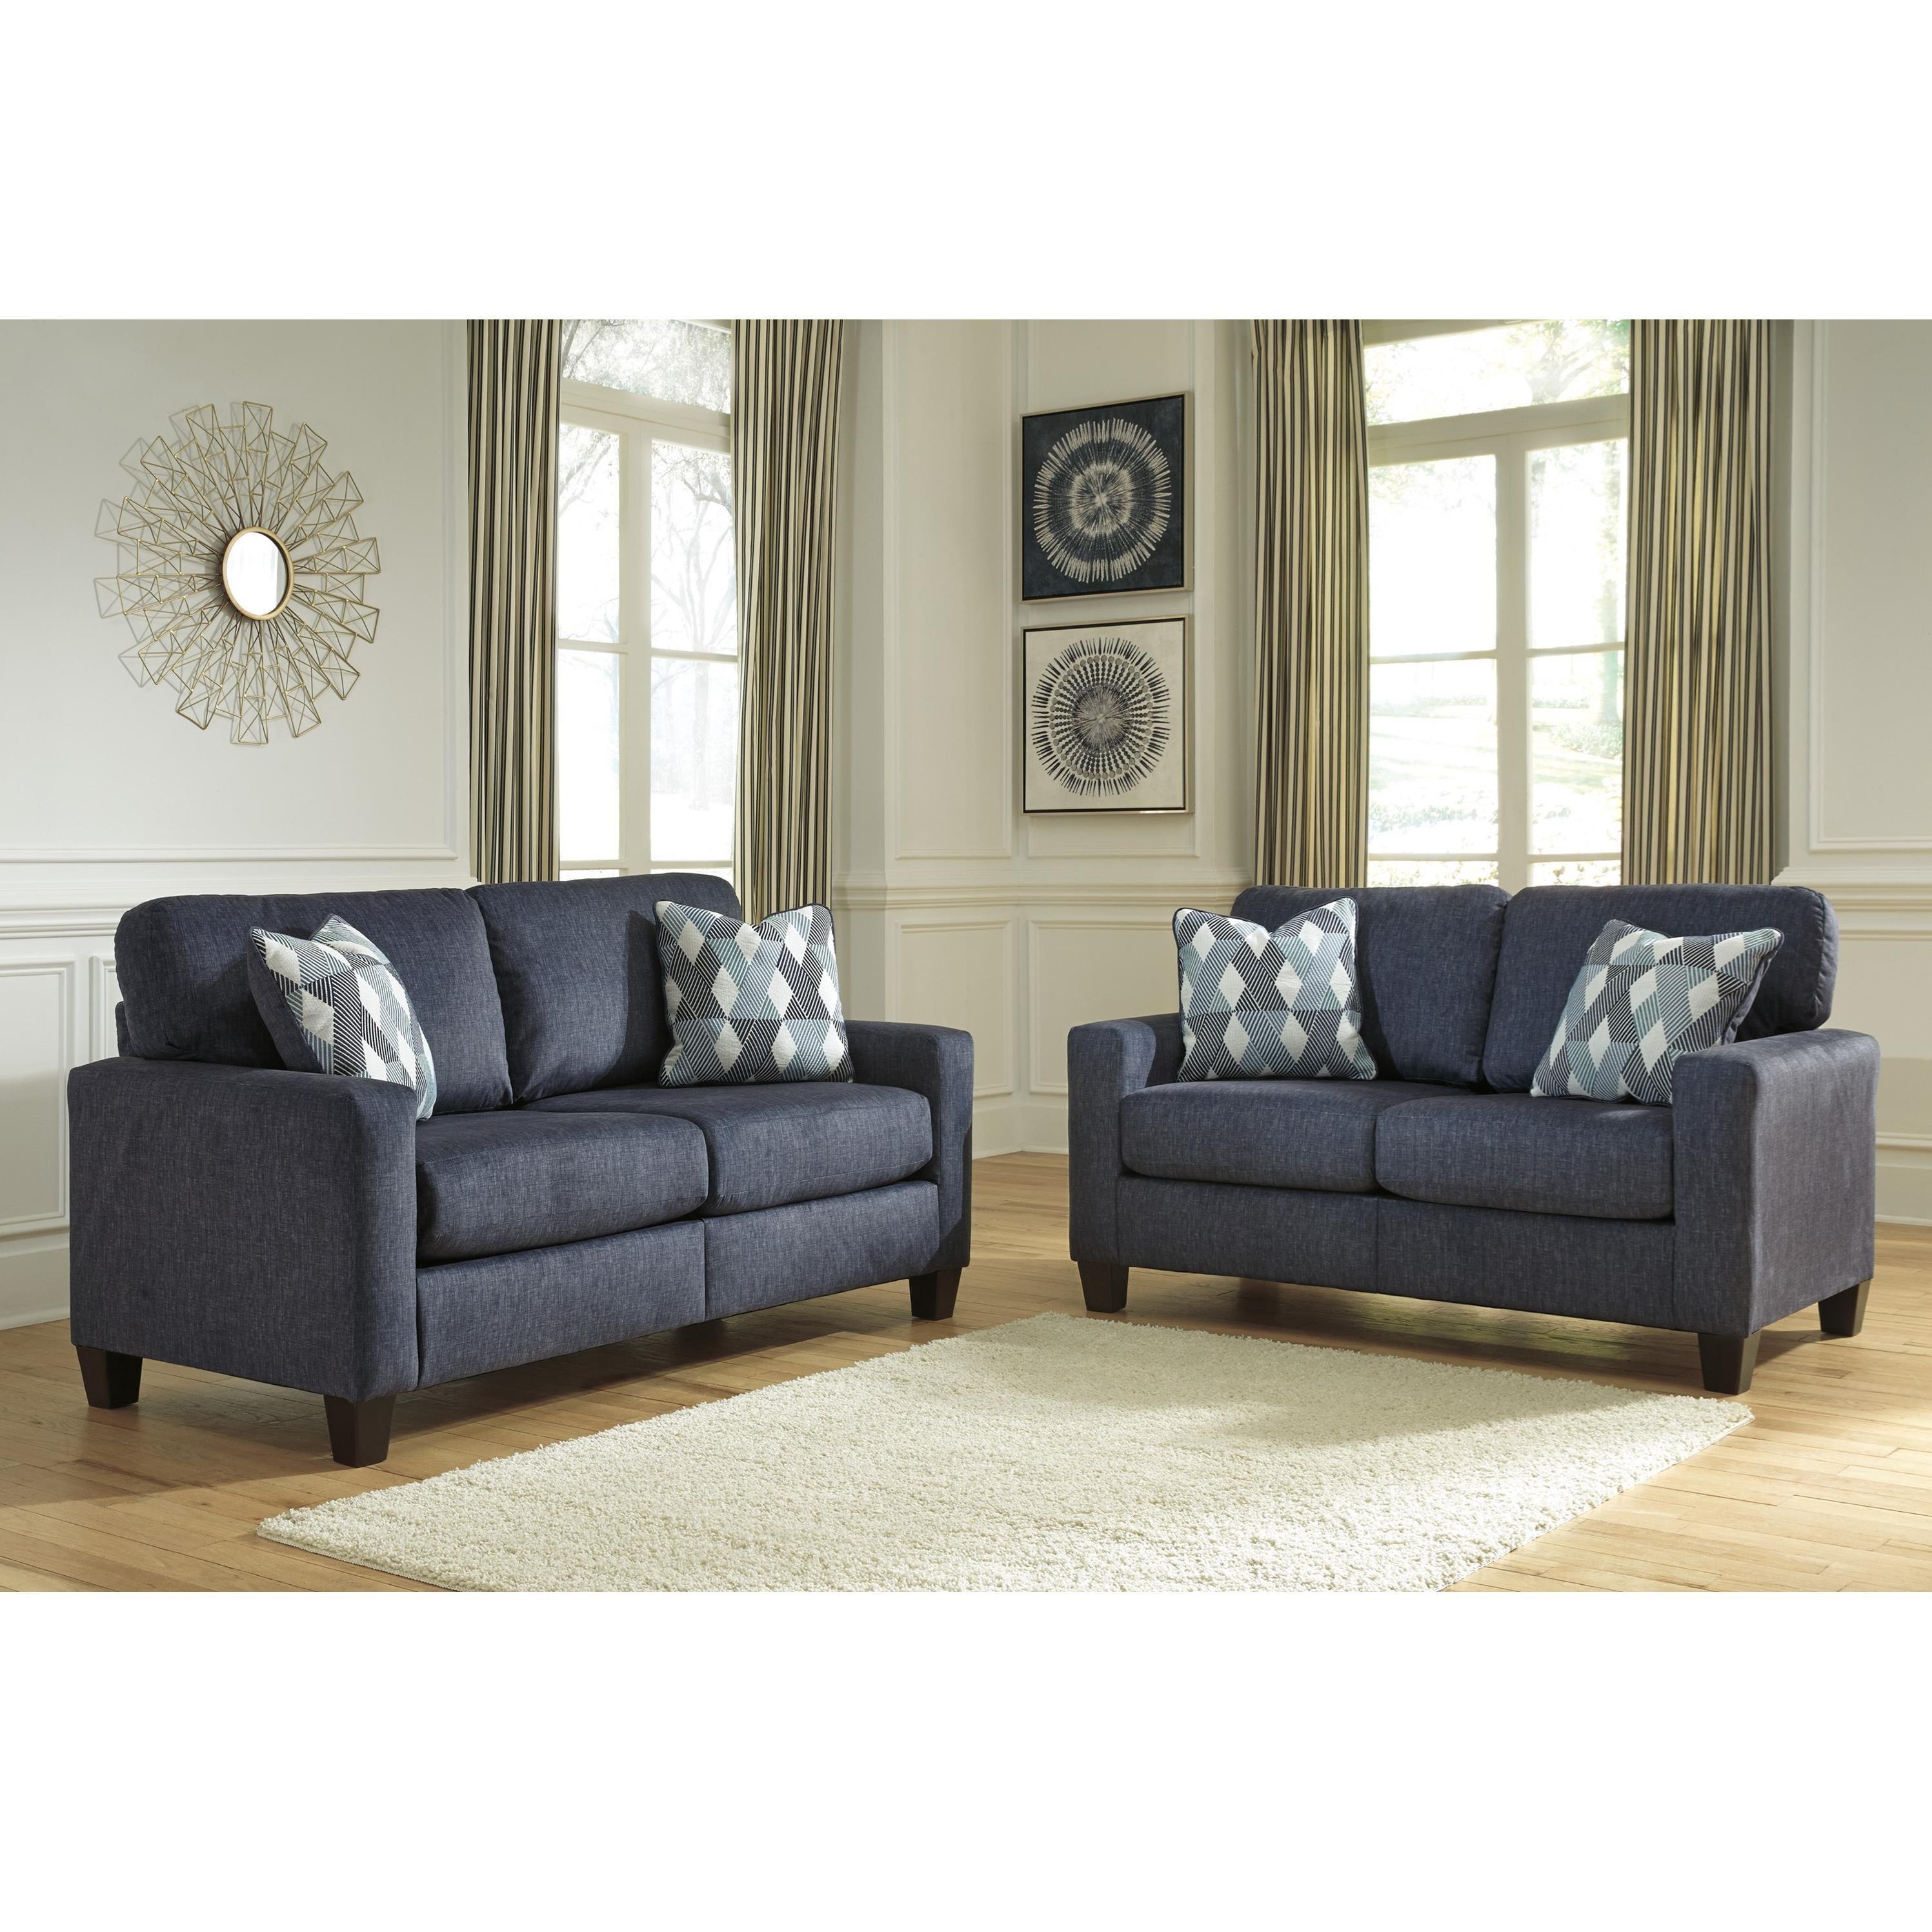 Styleline Burgos Living Room Group Efo Furniture Outlet Stationary Living Room Groups